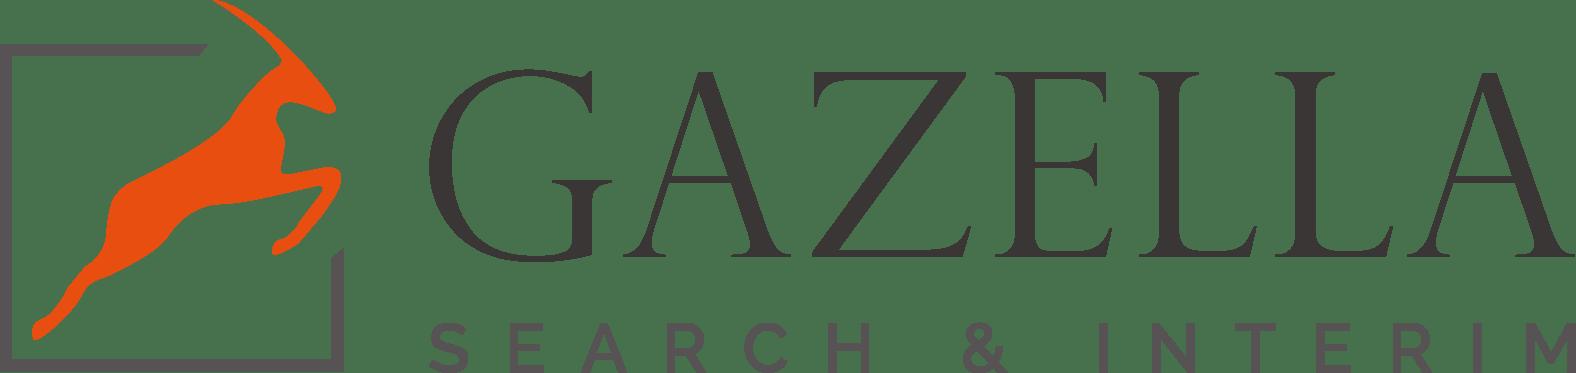 Gazella company logo